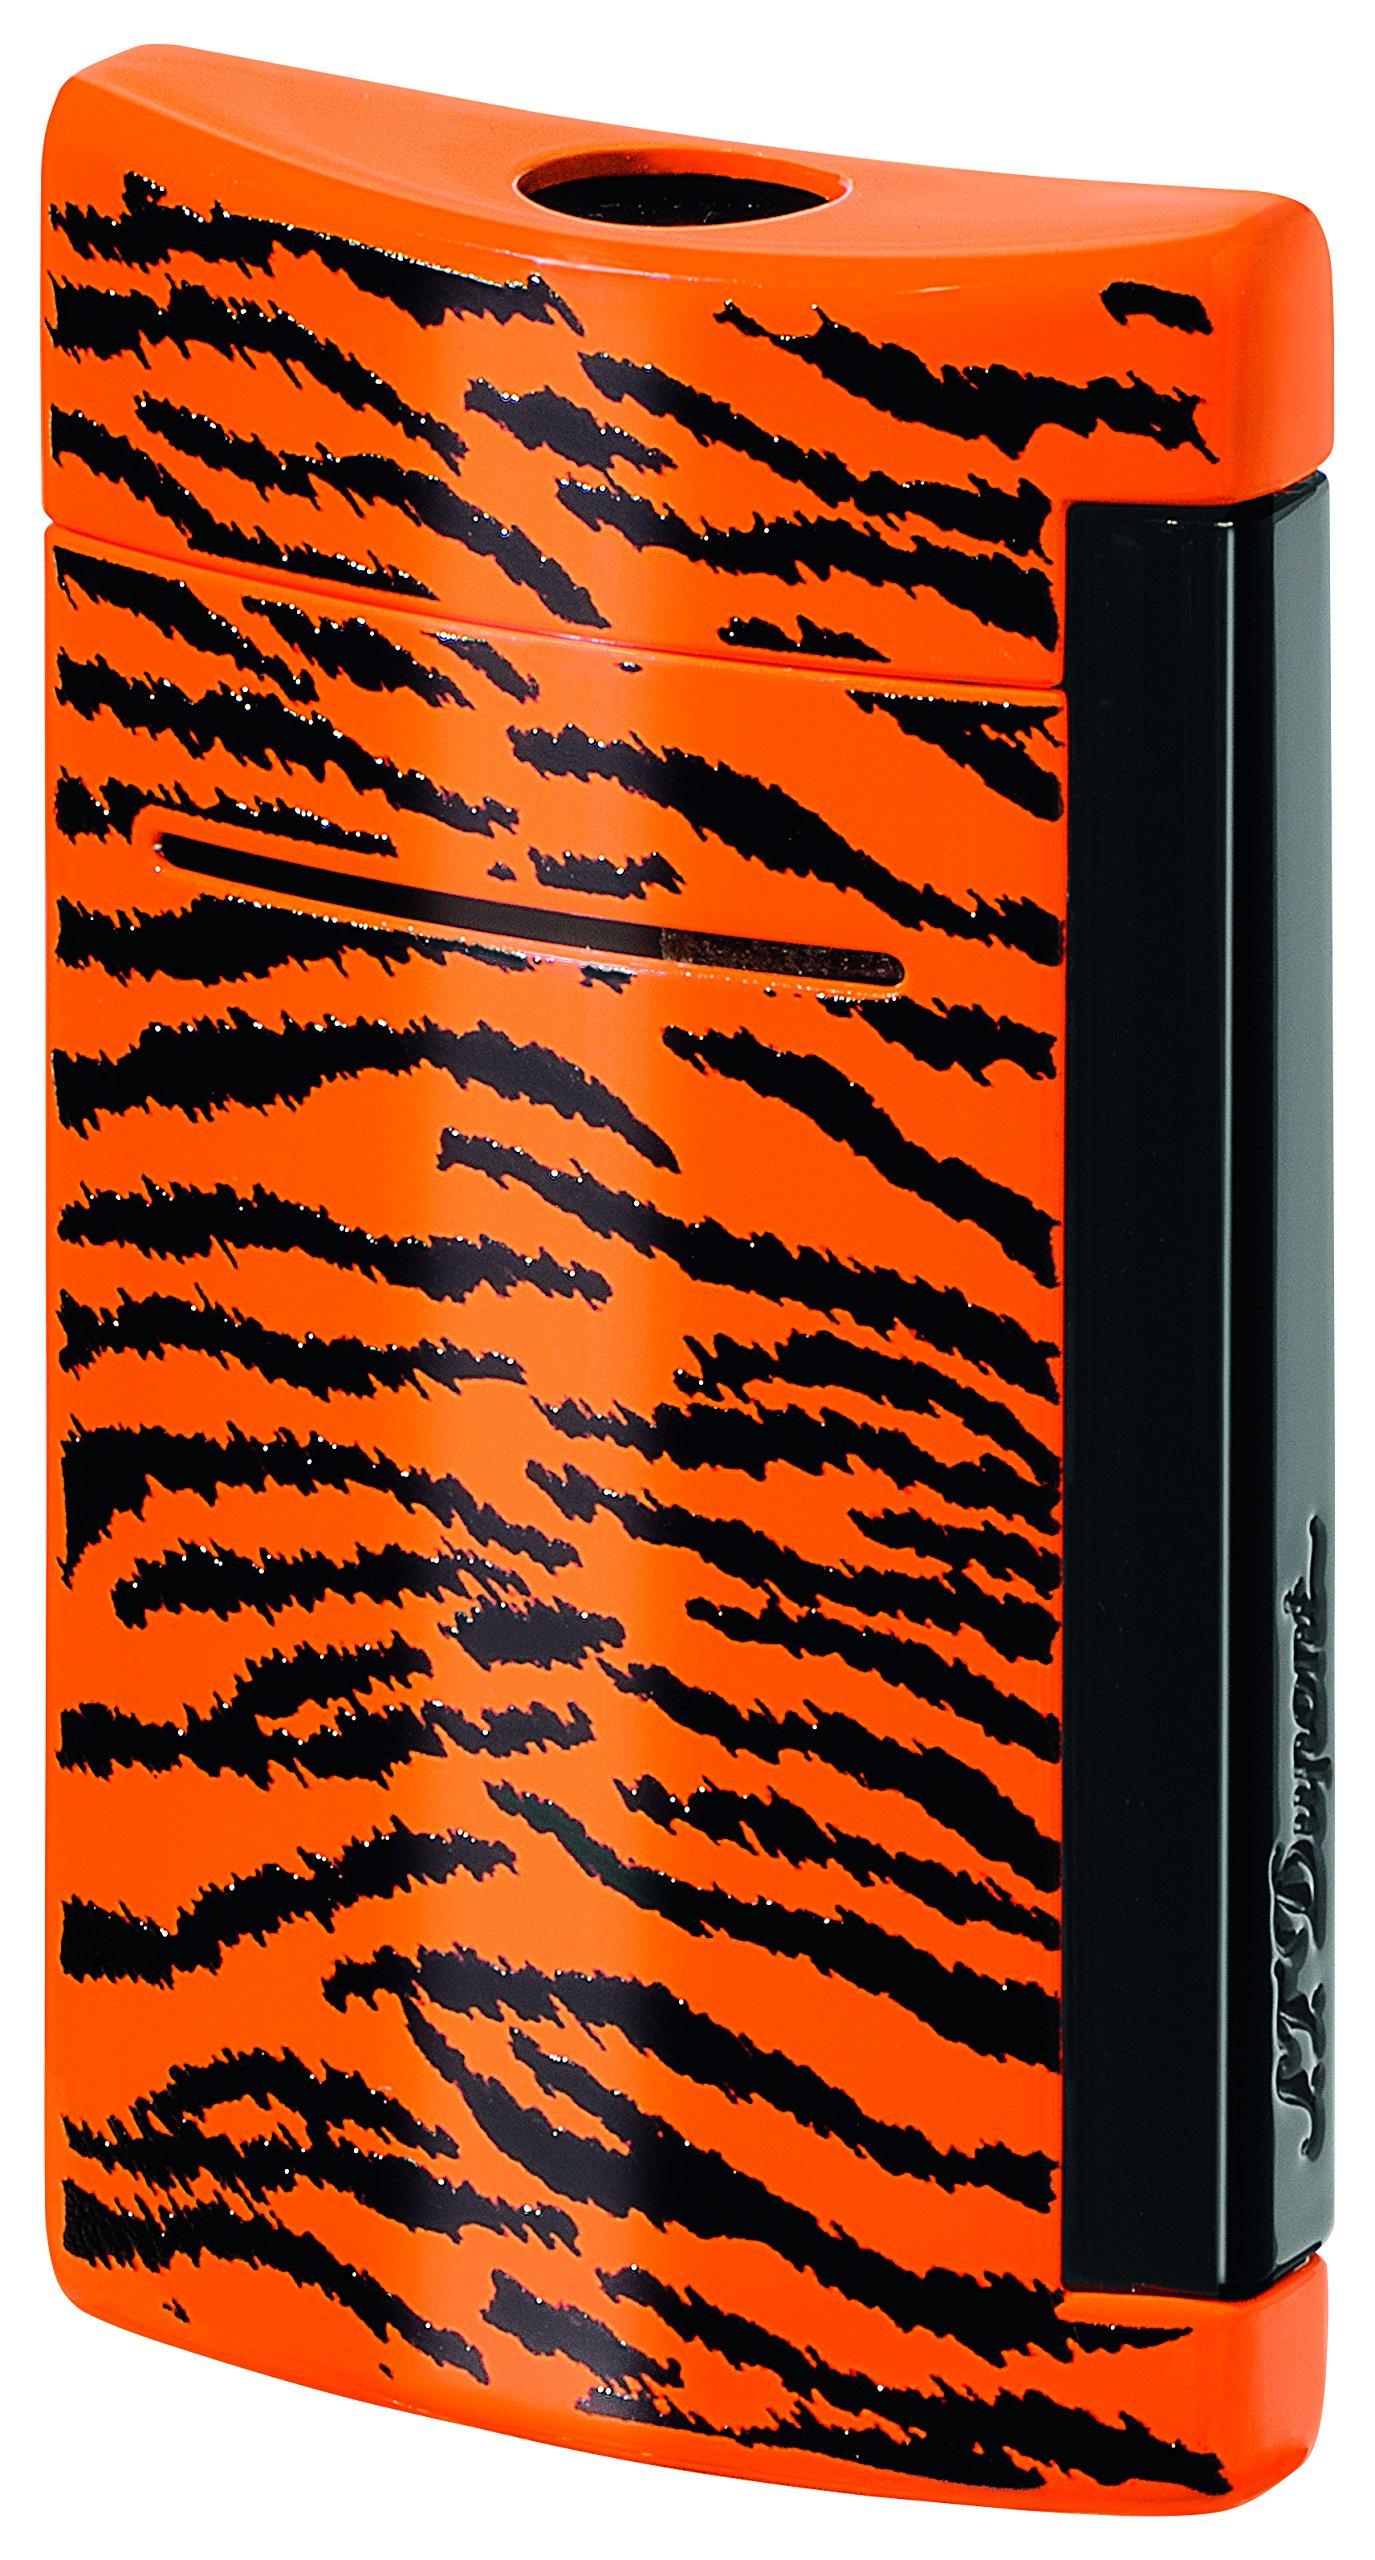 S.T. Dupont MiniJet Black and Orange Tiger Pattern Torch Flame Lighter by S.T. Dupont (Image #1)